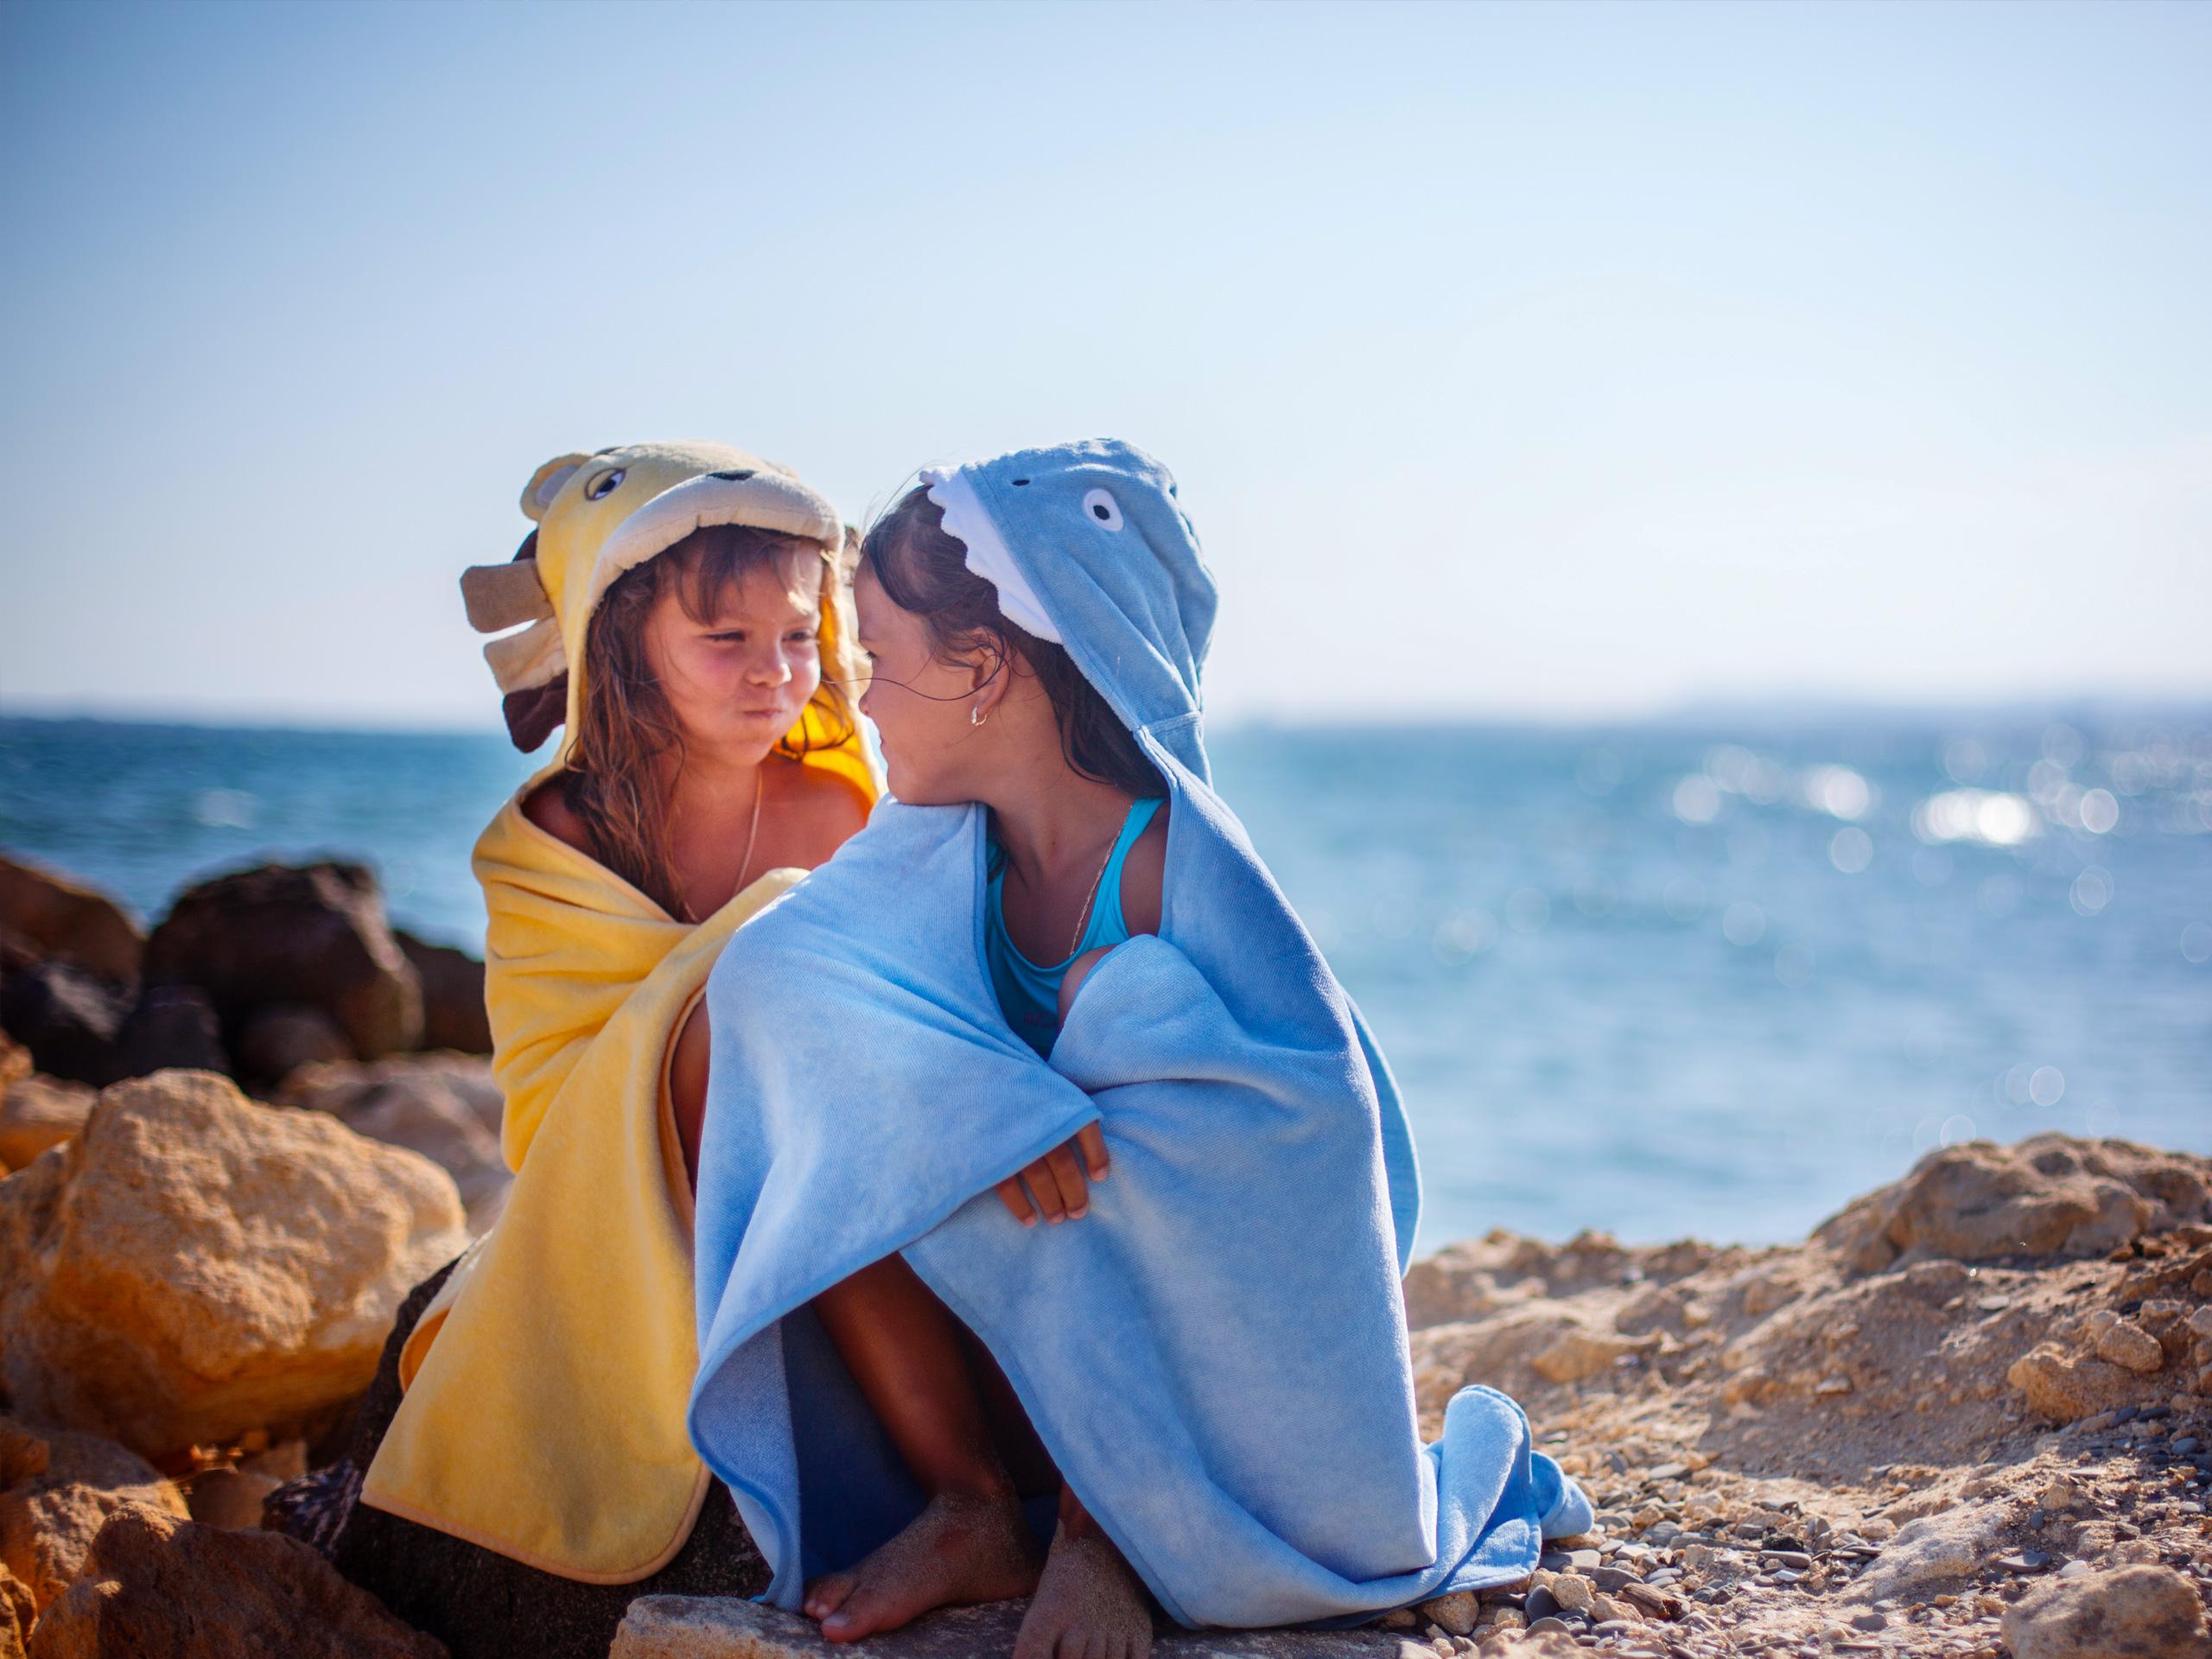 kids wearing beach towels; Courtesy of Kristina Zhuravleva/Shutterstock